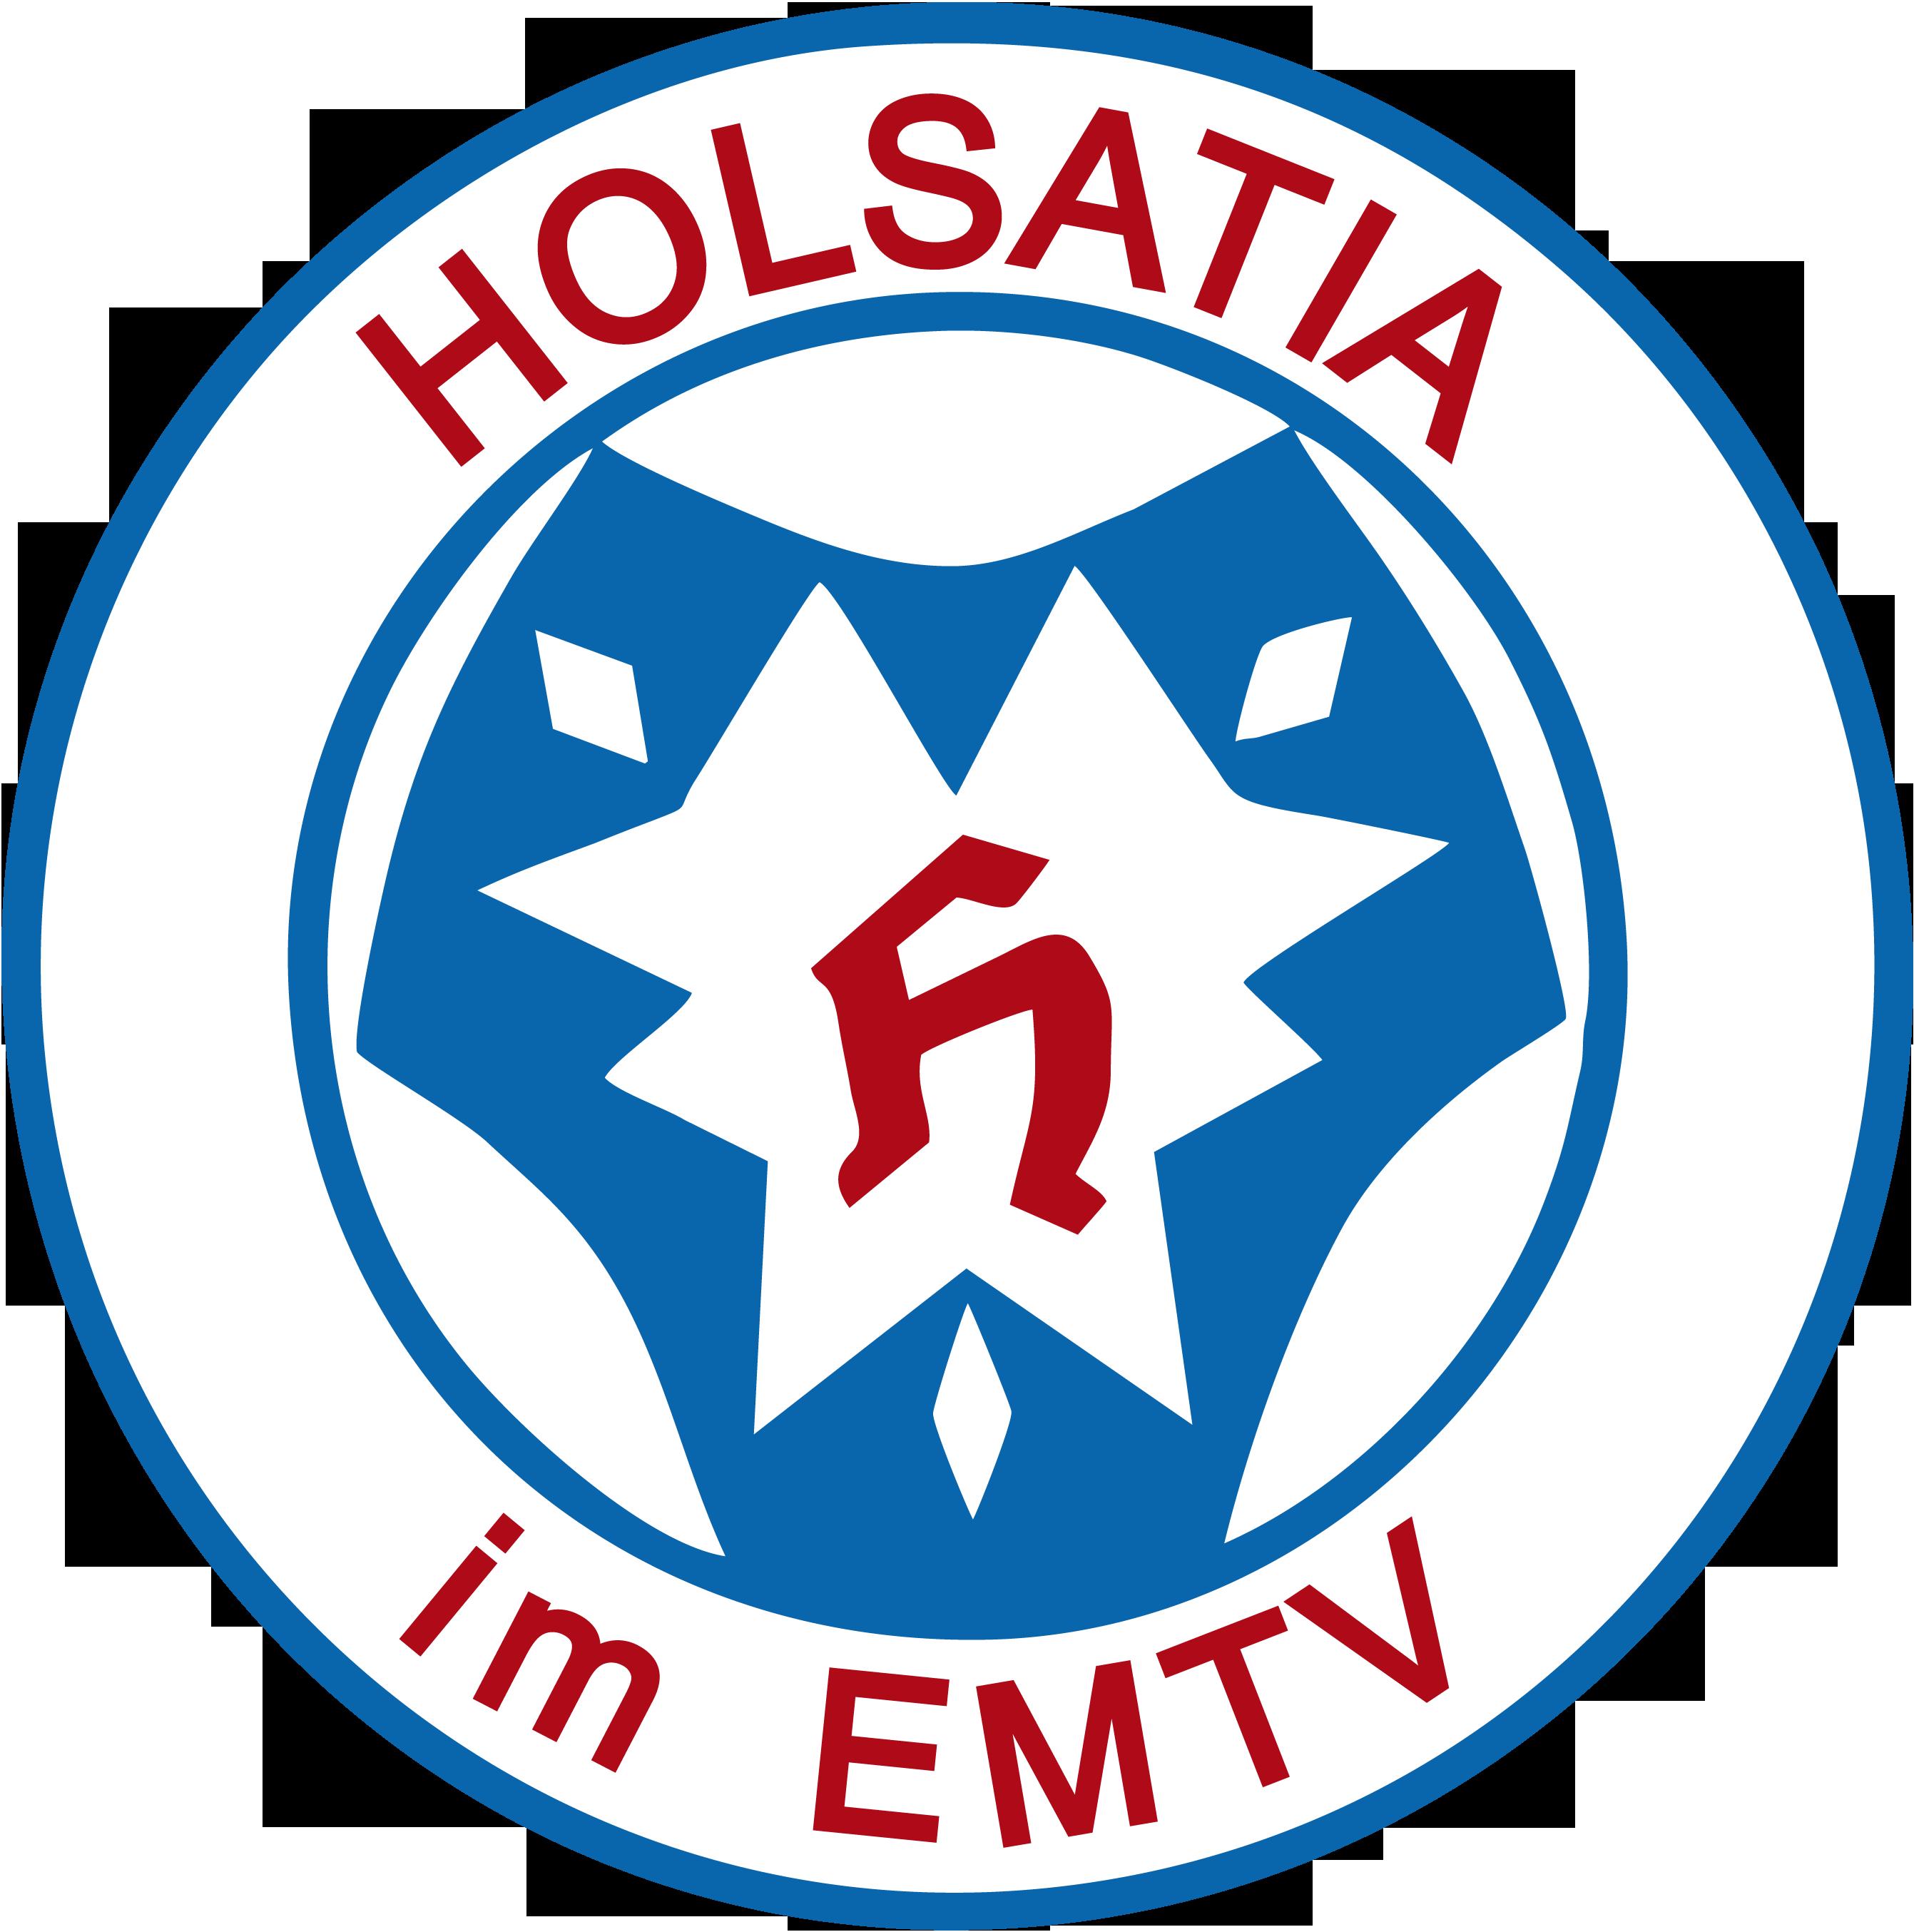 HOLSATIA Elmshorn im EMTV